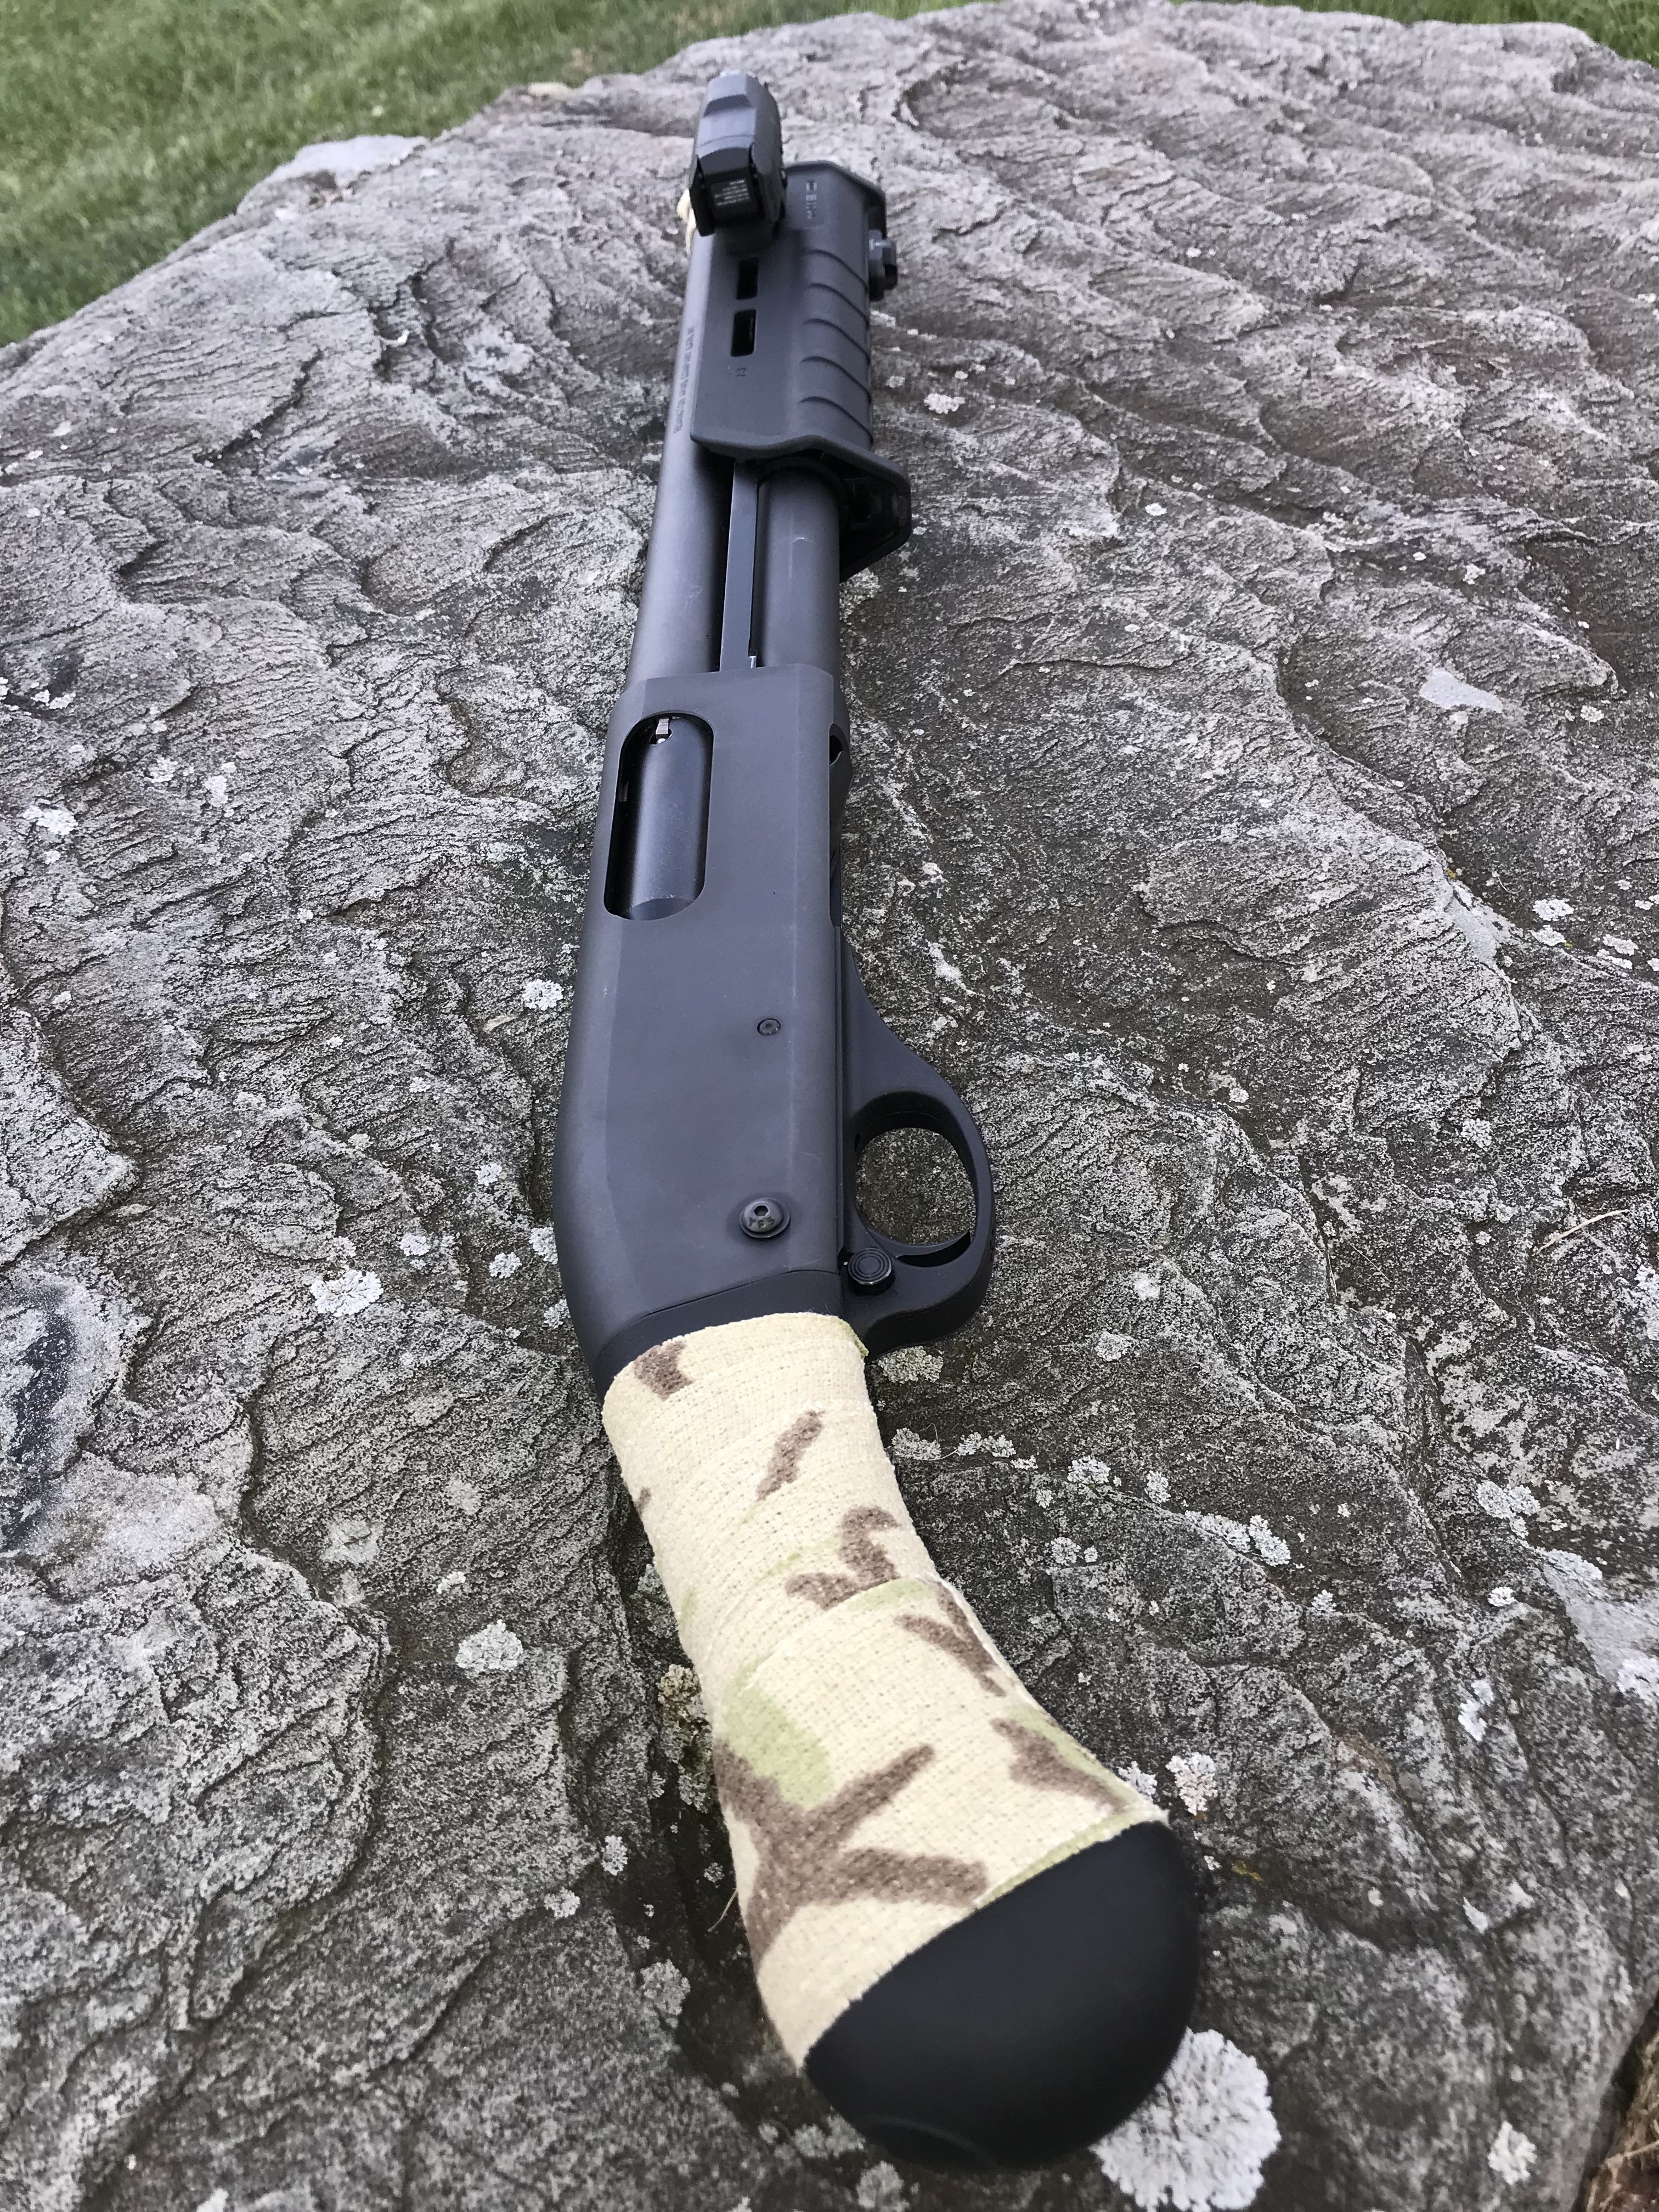 Remington tac 14 with camo wrap for better grip – Artofit